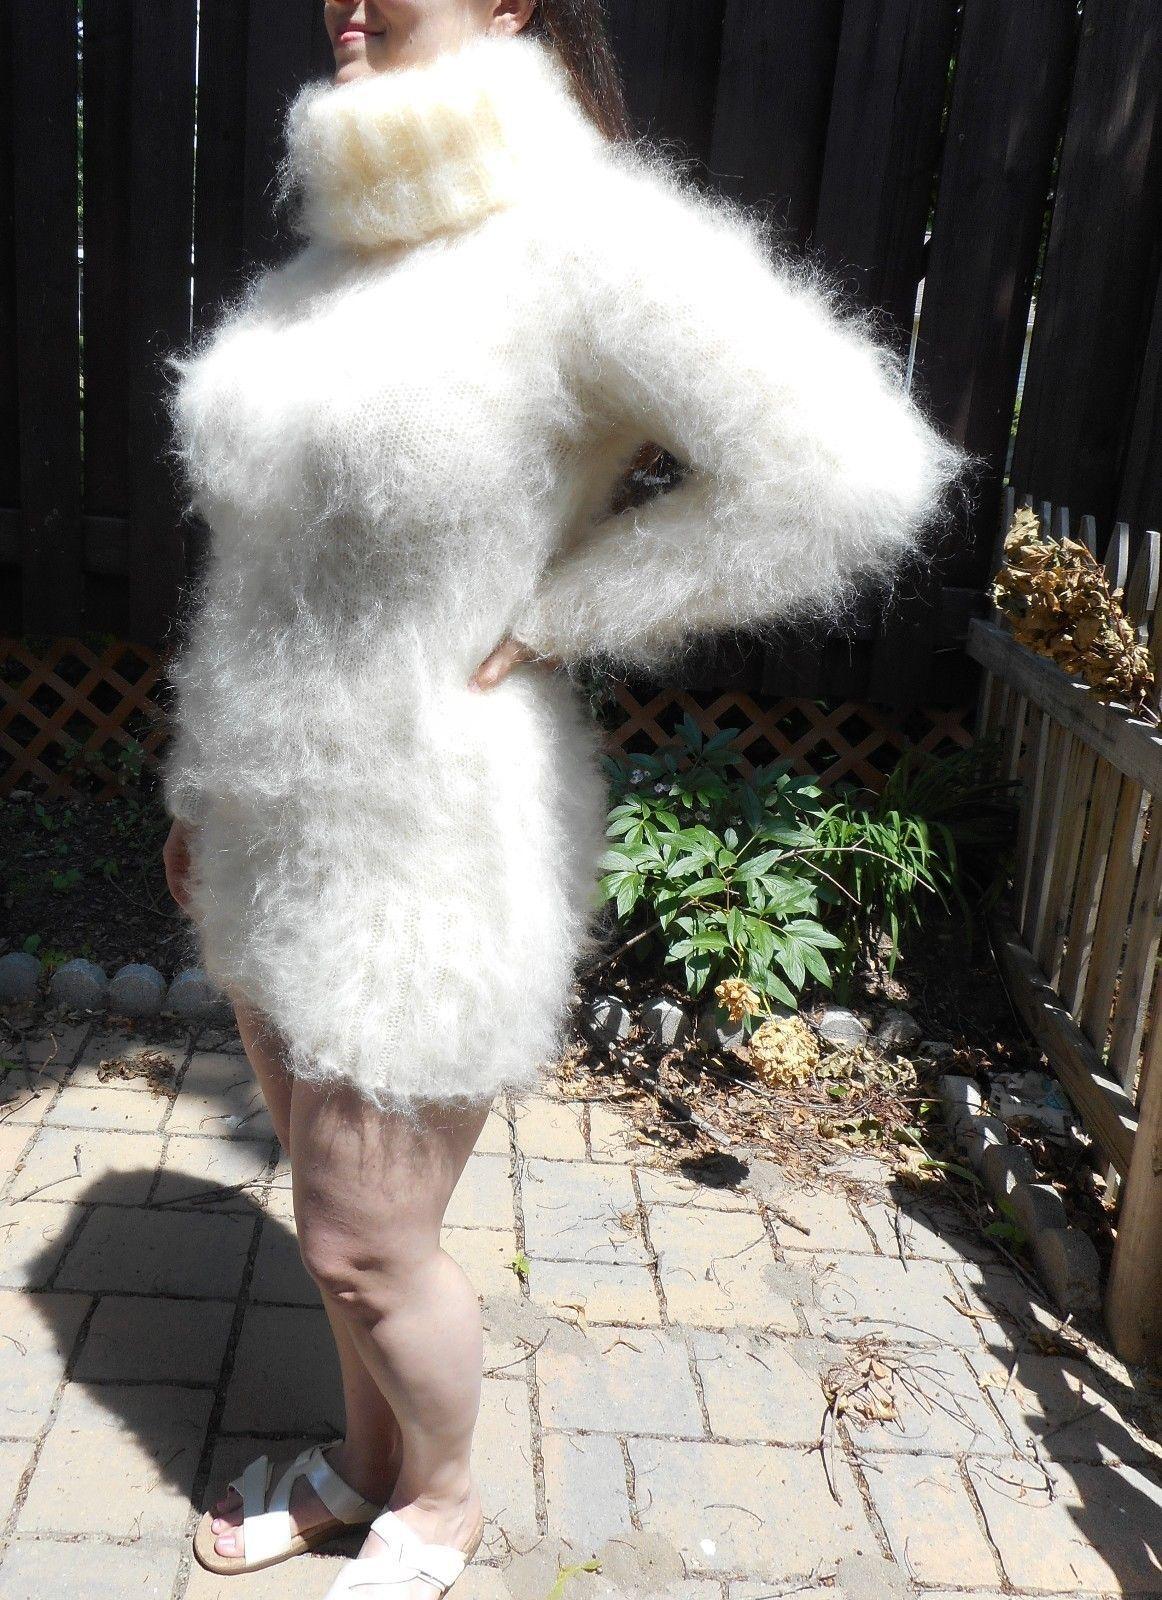 fuzzy wool fetish